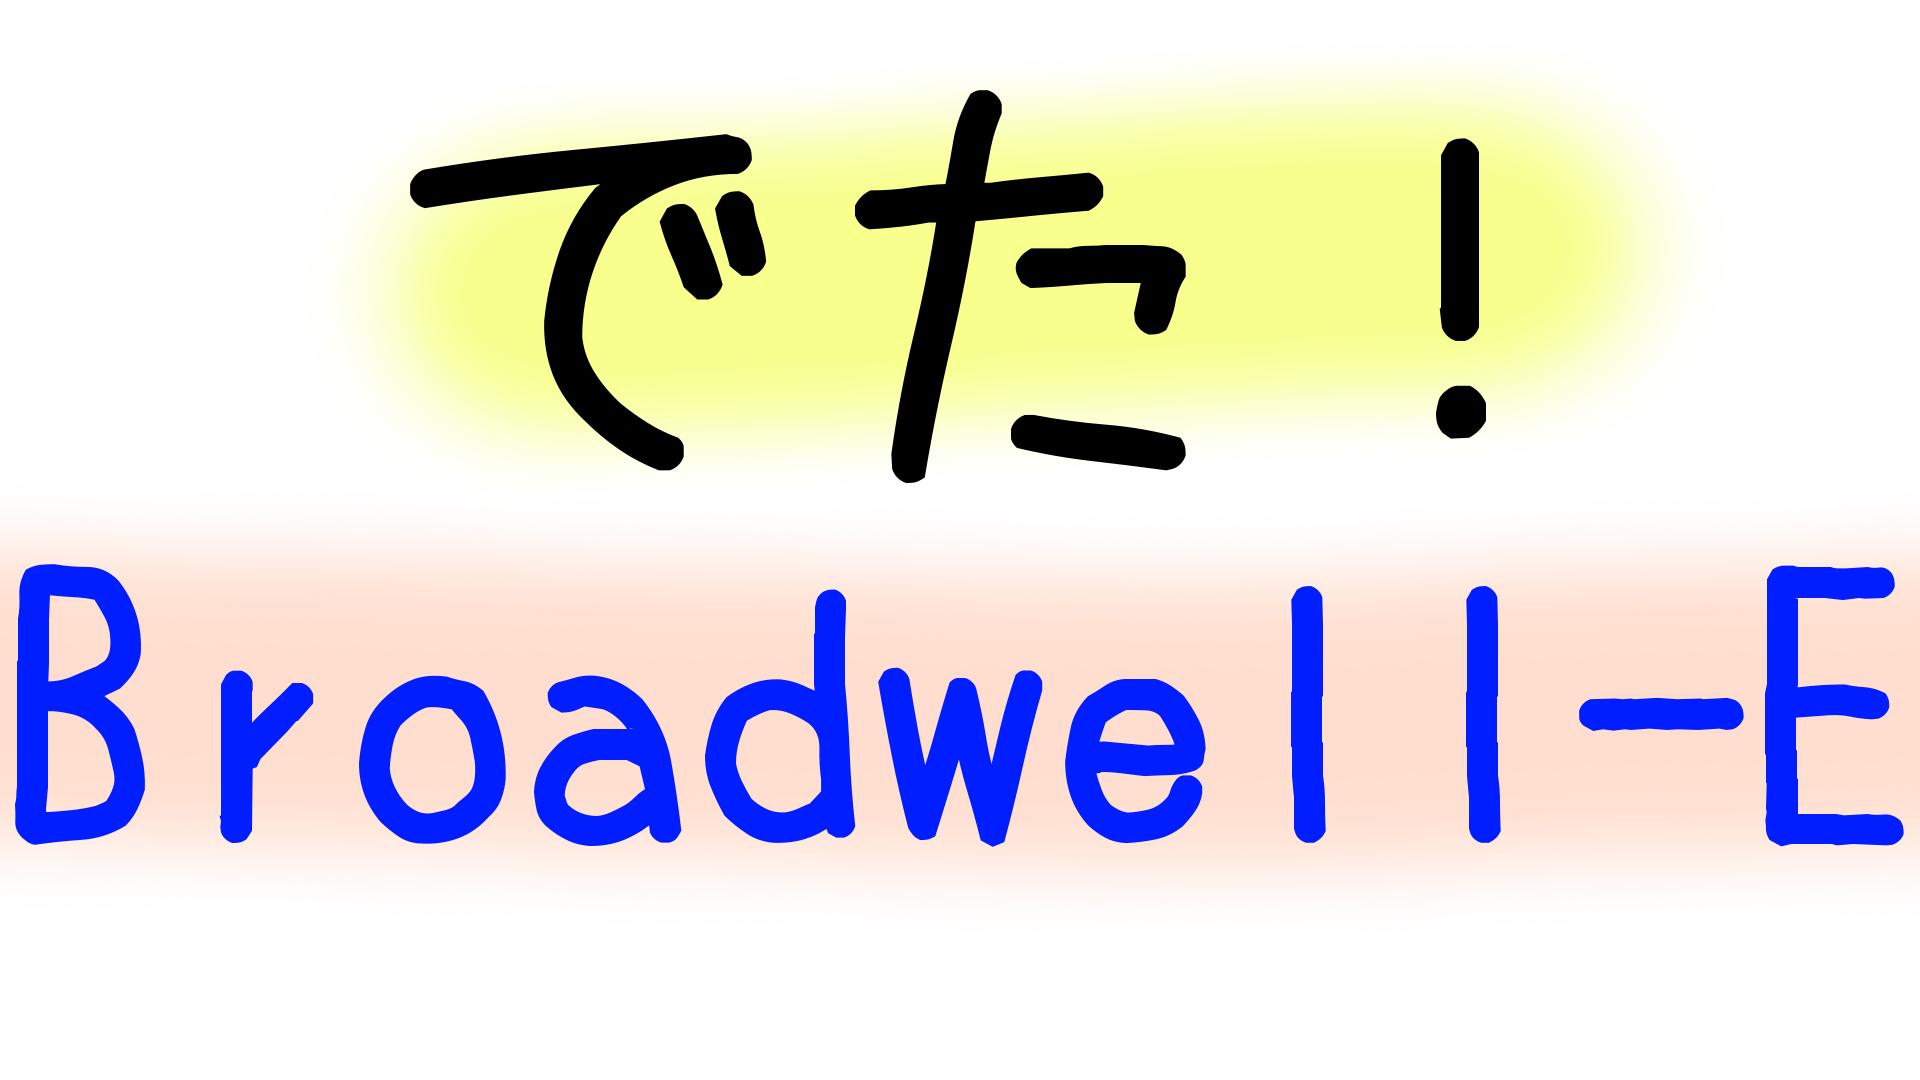 Broadwell-Eが販売開始!